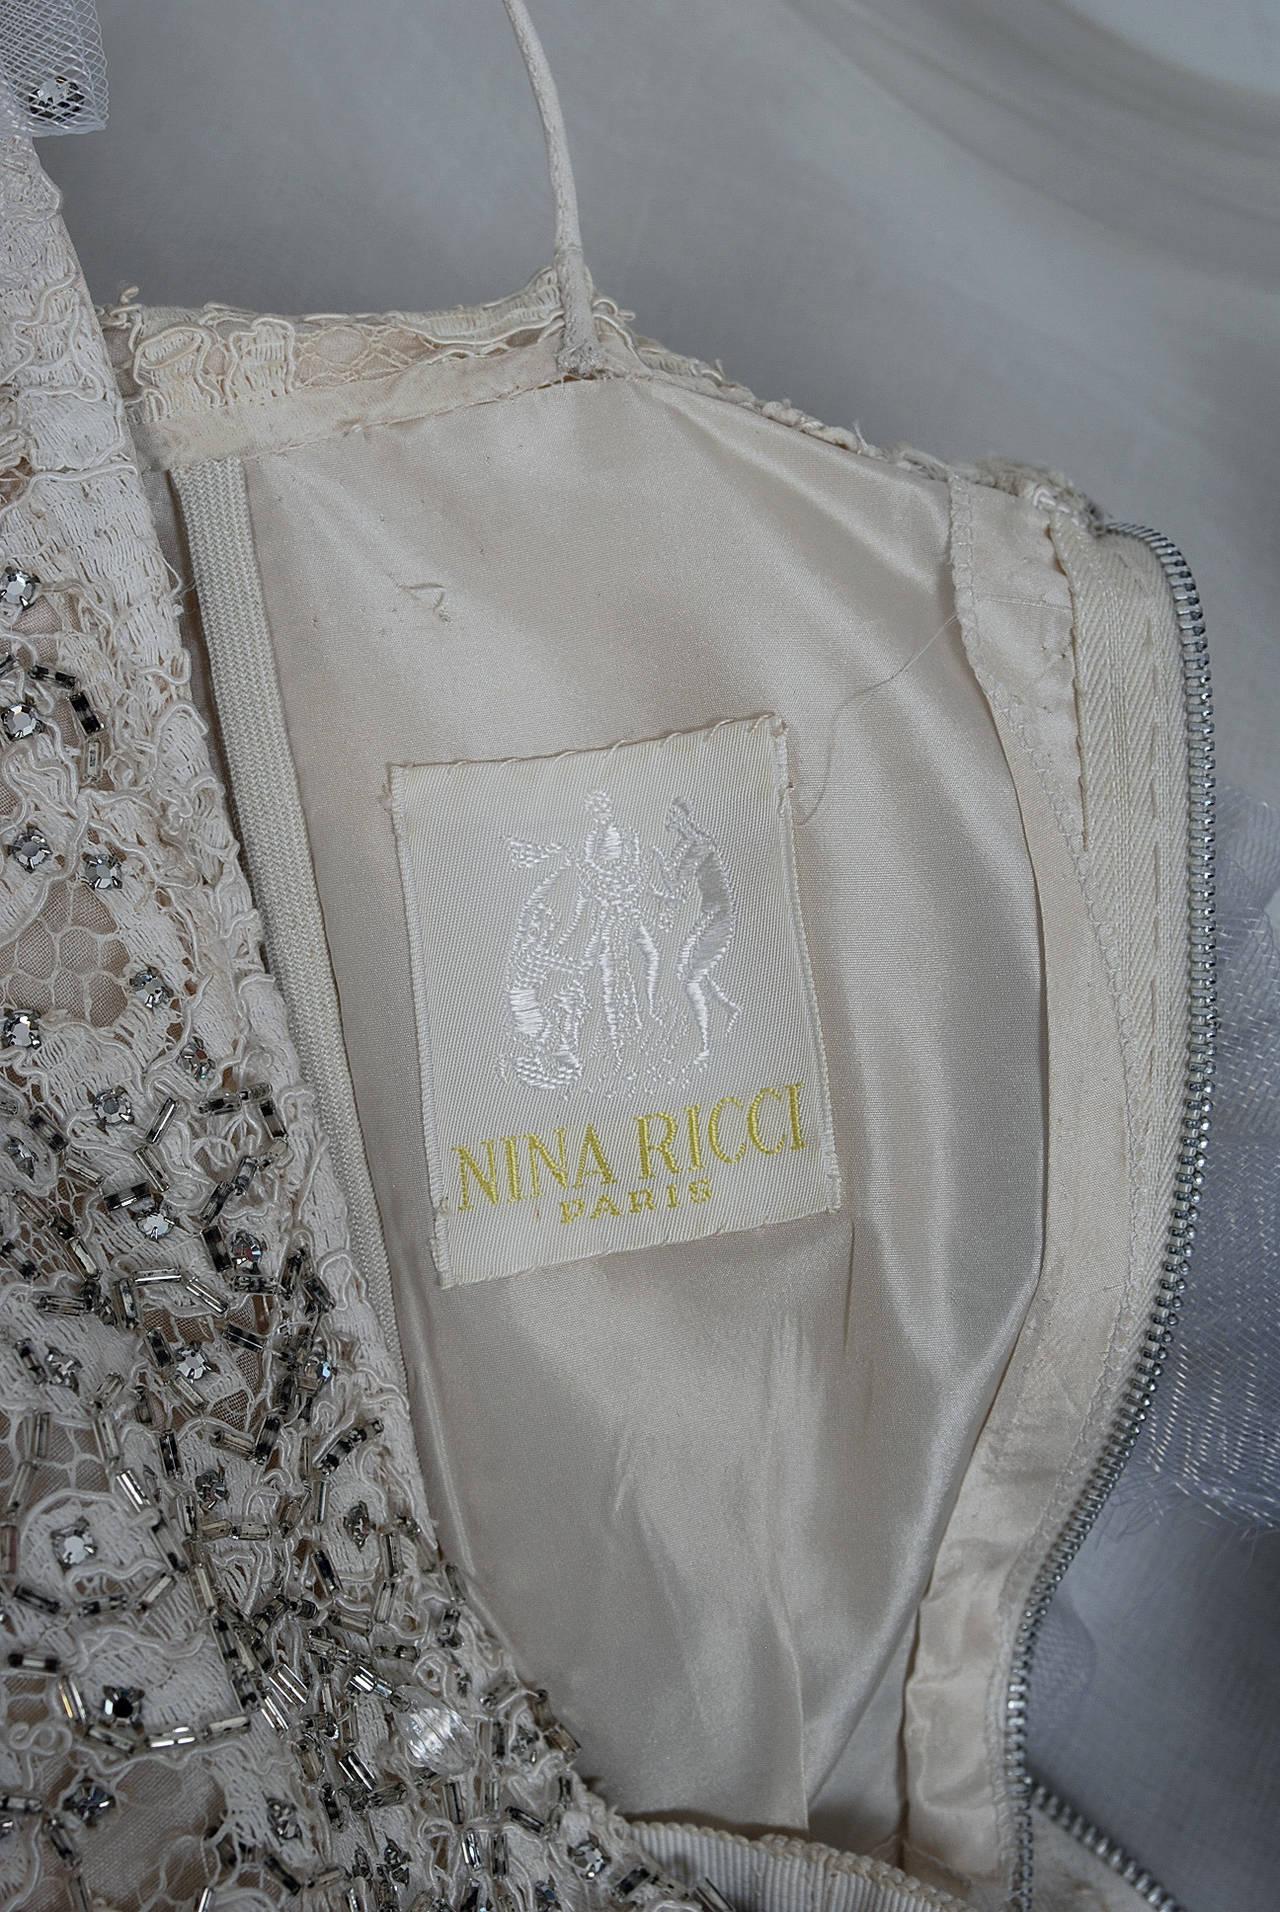 1955 Nina Ricci Paris Haute-Couture White Rhinestone Lace Silk Mermaid Gown For Sale 2